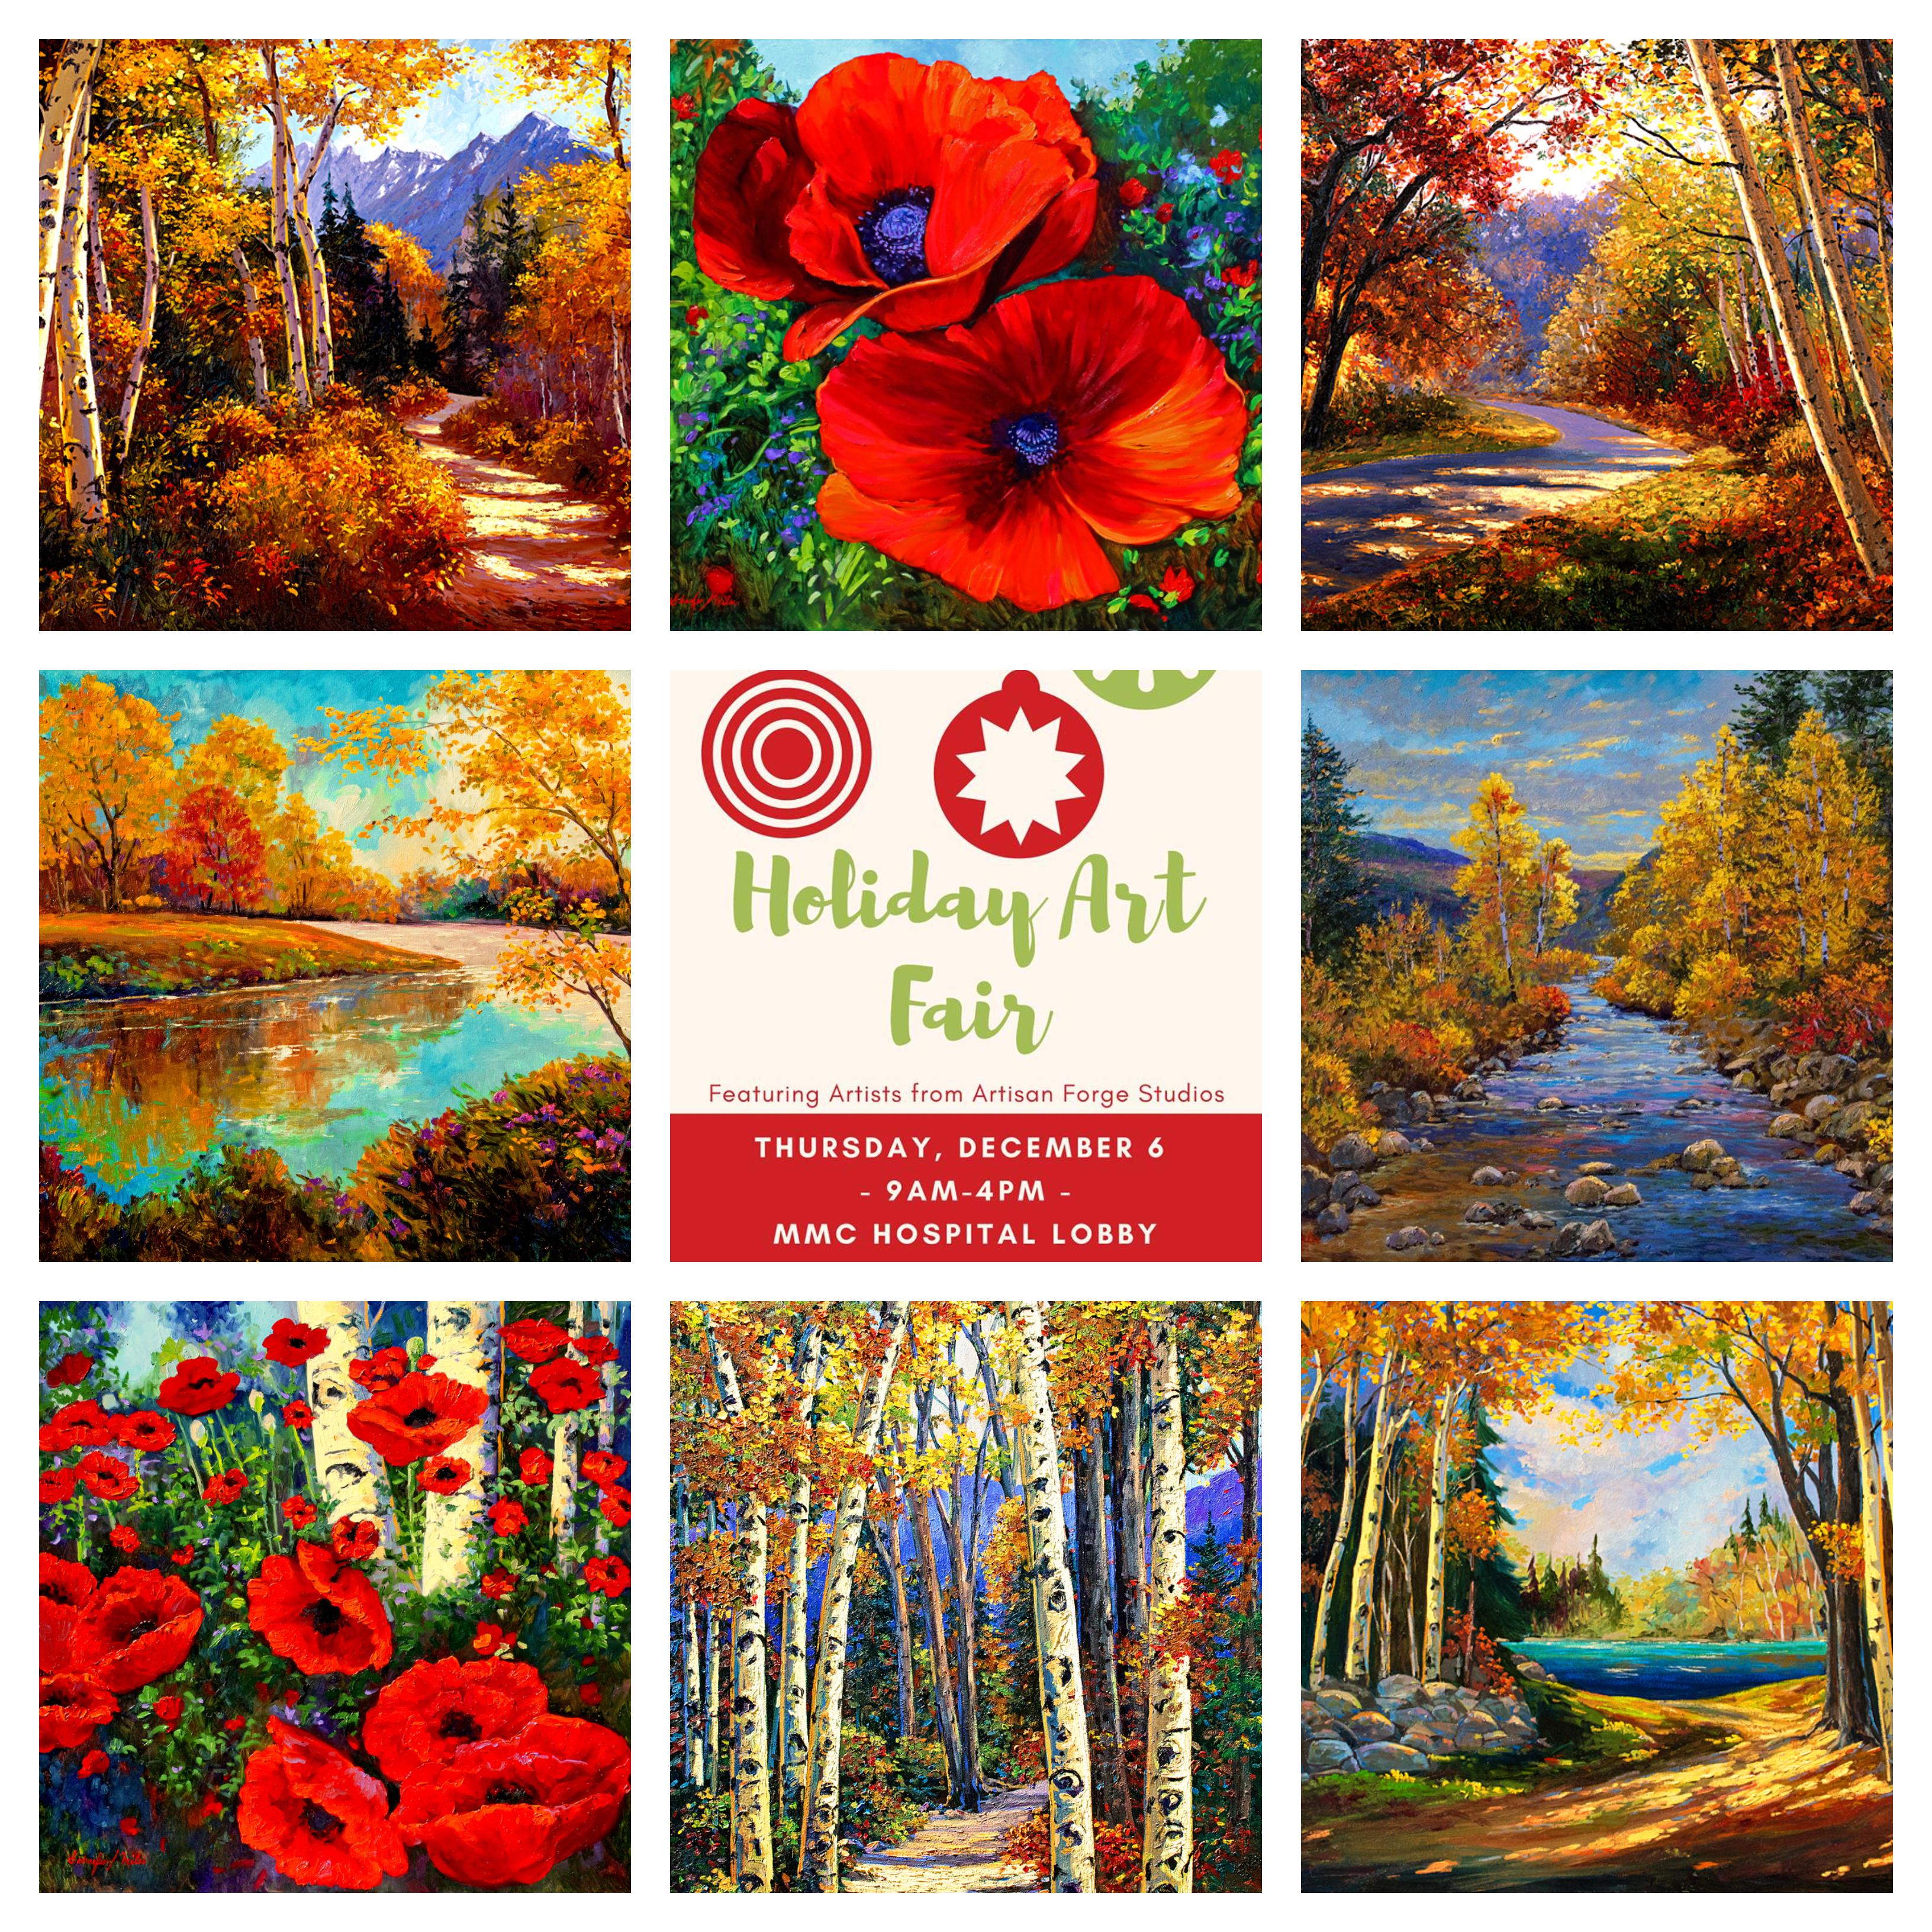 Holiday Art Fair MMC